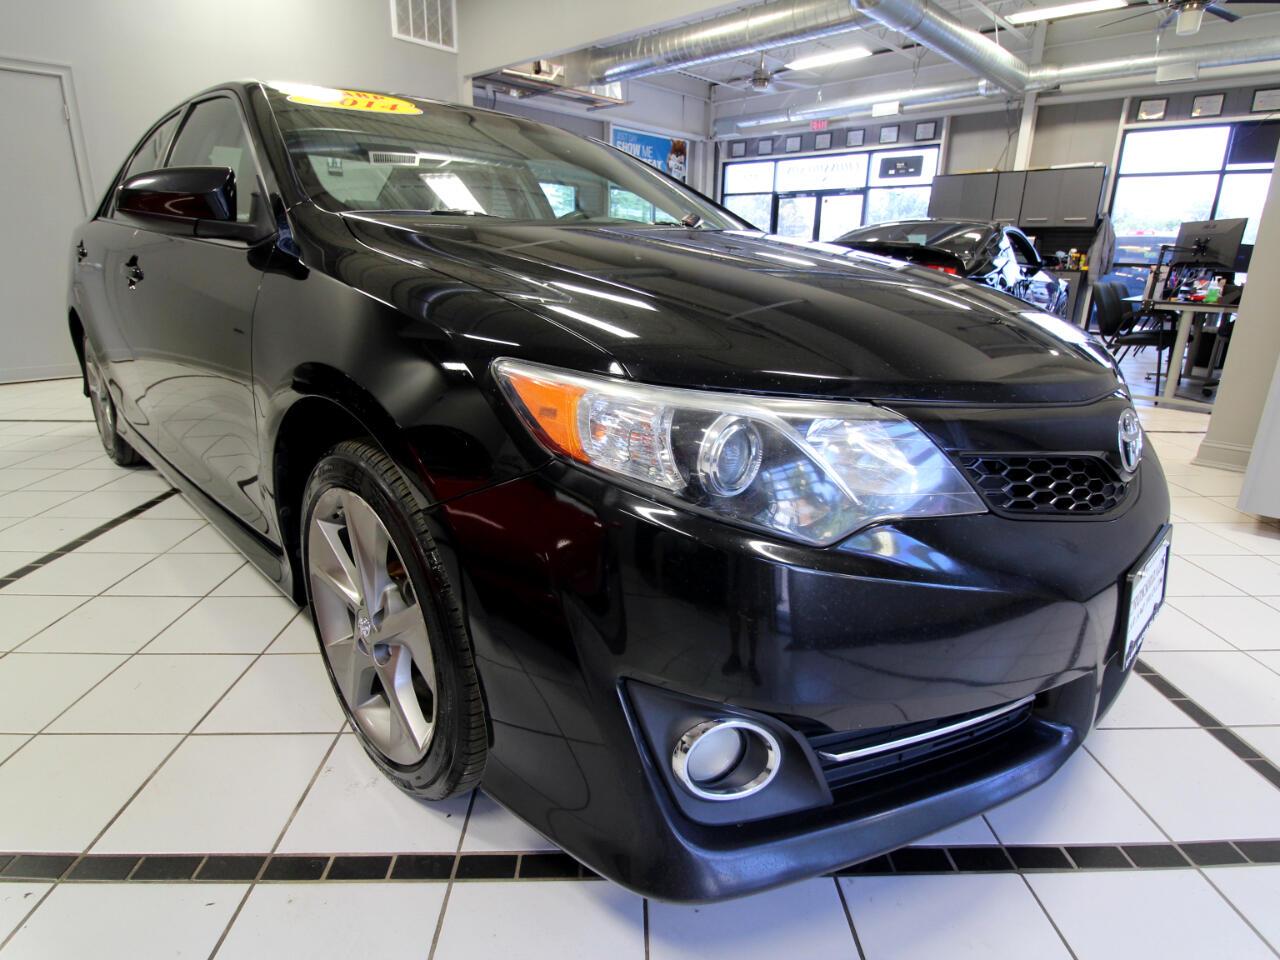 2014 Toyota Camry 4dr Sdn V6 Auto SE (Natl) *Ltd Avail*